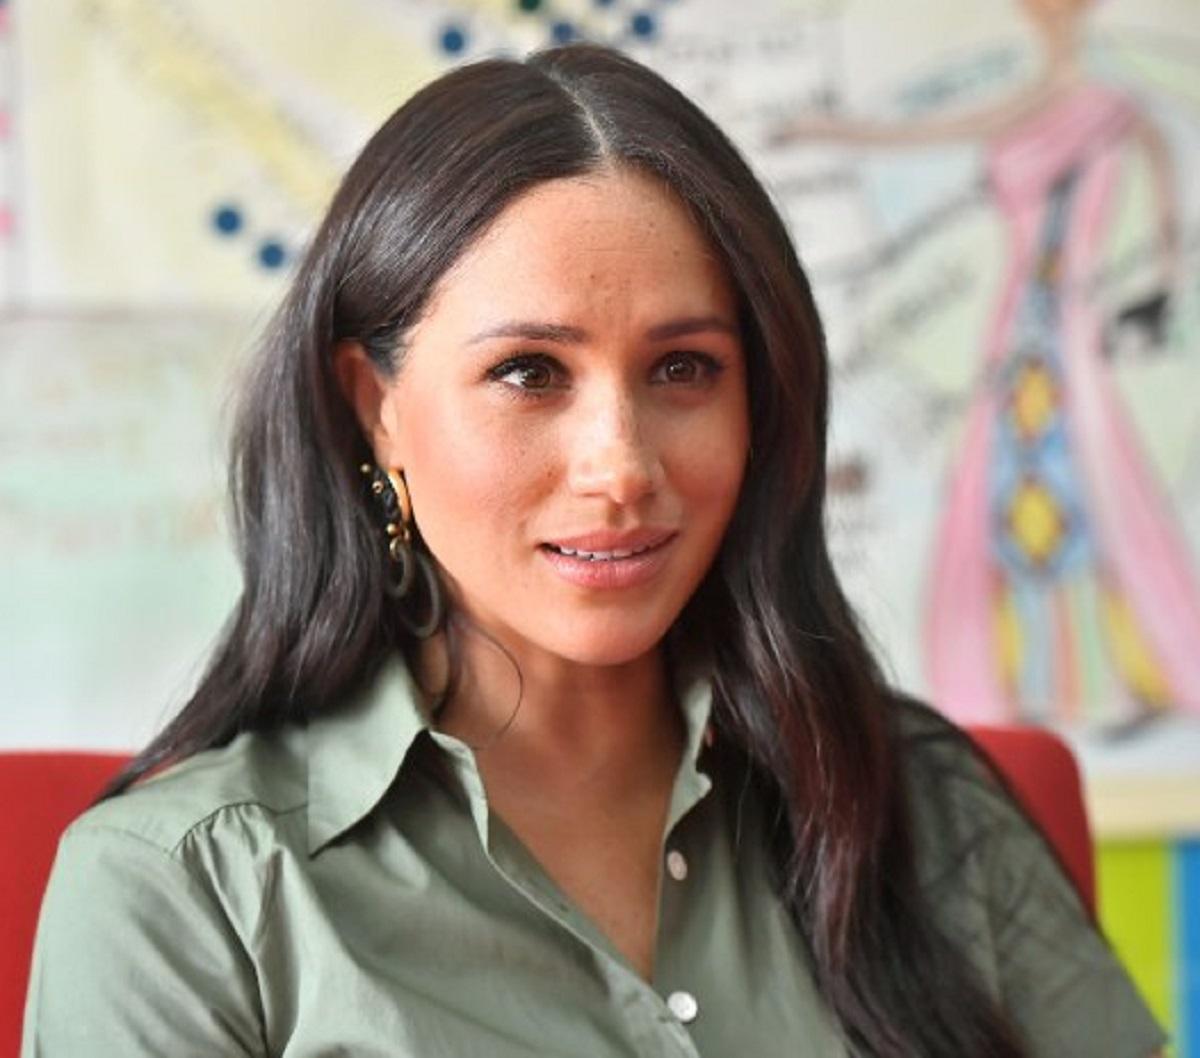 Meghan Markle flop progetto donne critiche